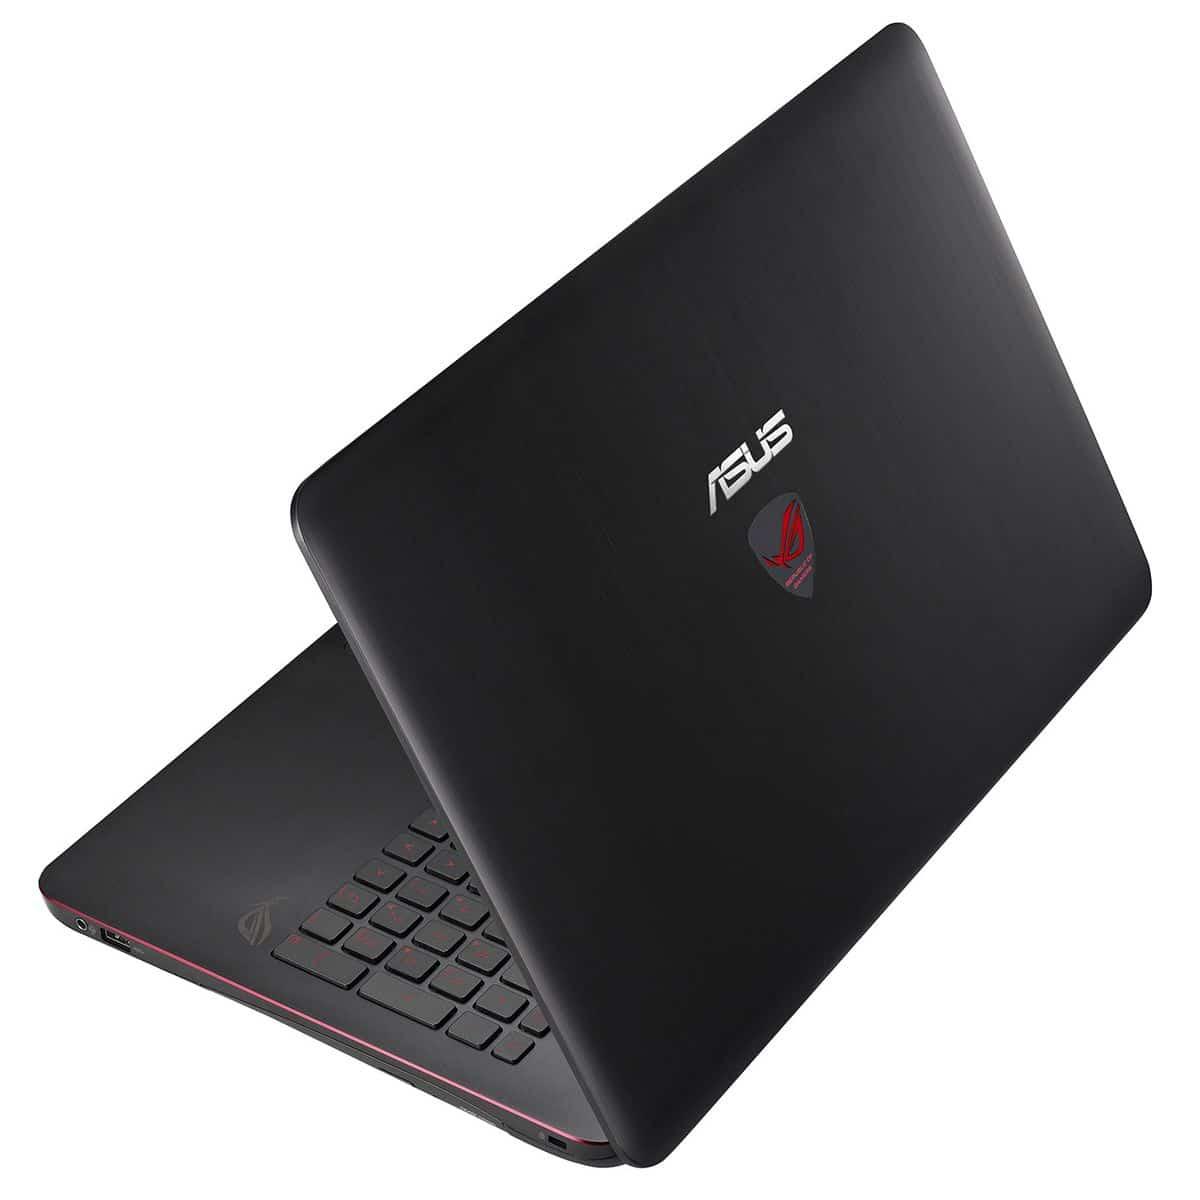 "<span class=""tagtitre"">Promo 899€ - </span>Asus G551JW-DM221T, PC portable 15 pouces Full HD mat gamer"